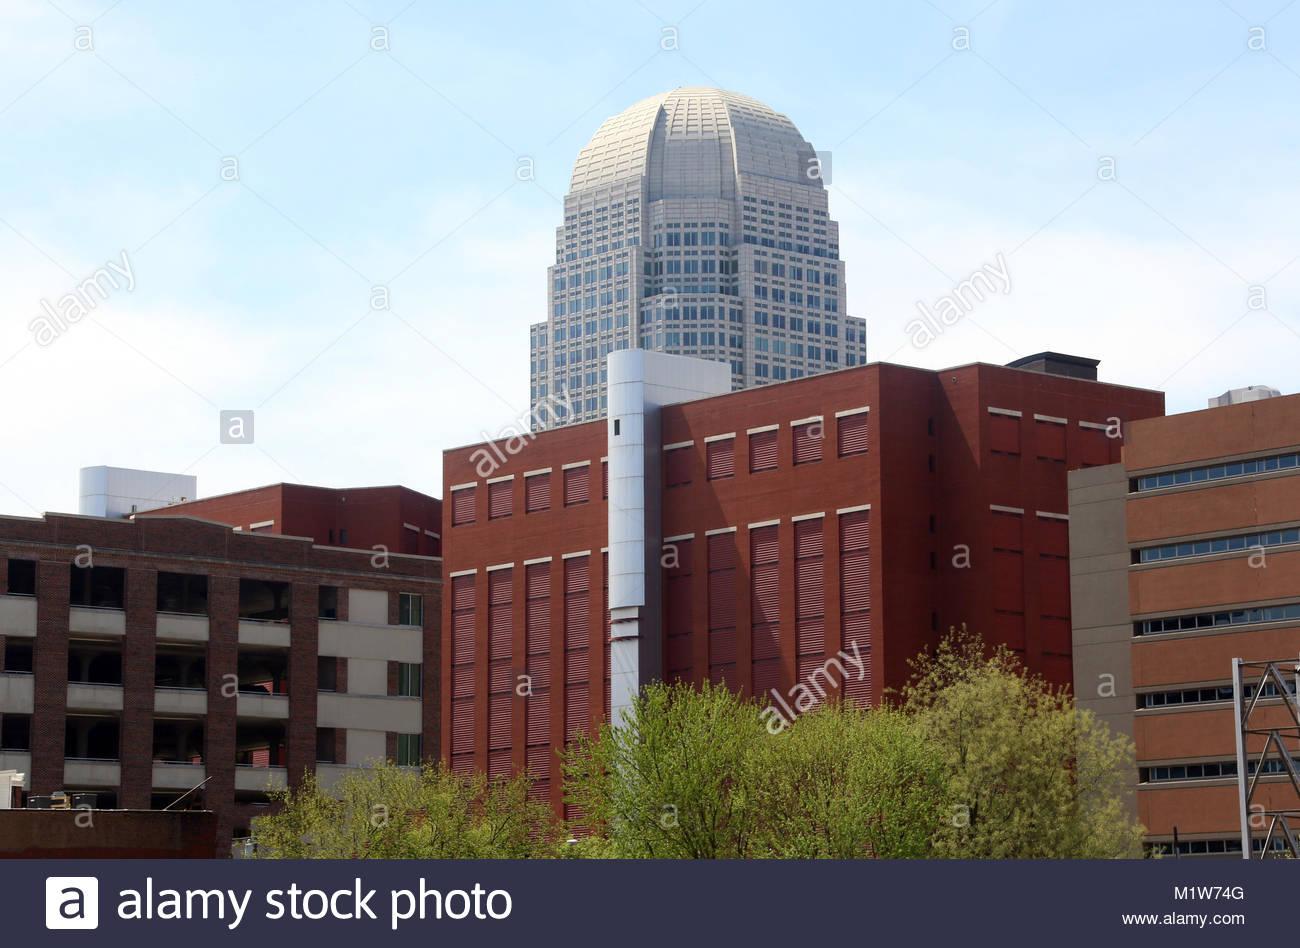 View of Downtown Winston-Salem, North Carolina Skyline Stock Photo